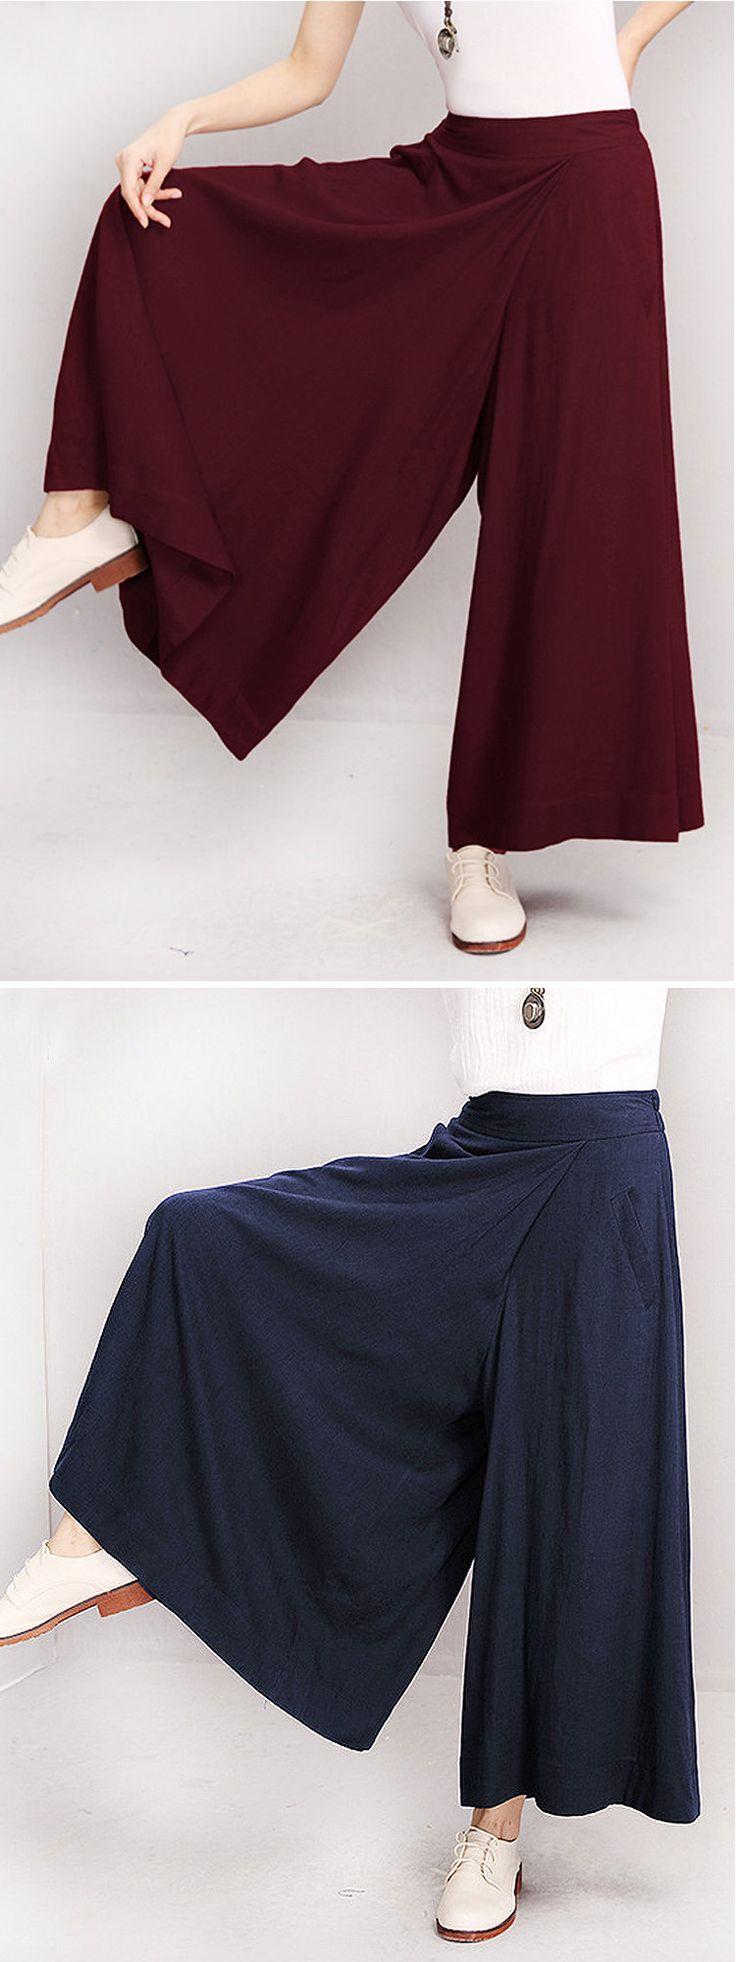 US$ 23.49 O-NEWE Elastic Waist Pure Color Wide Leg Pants